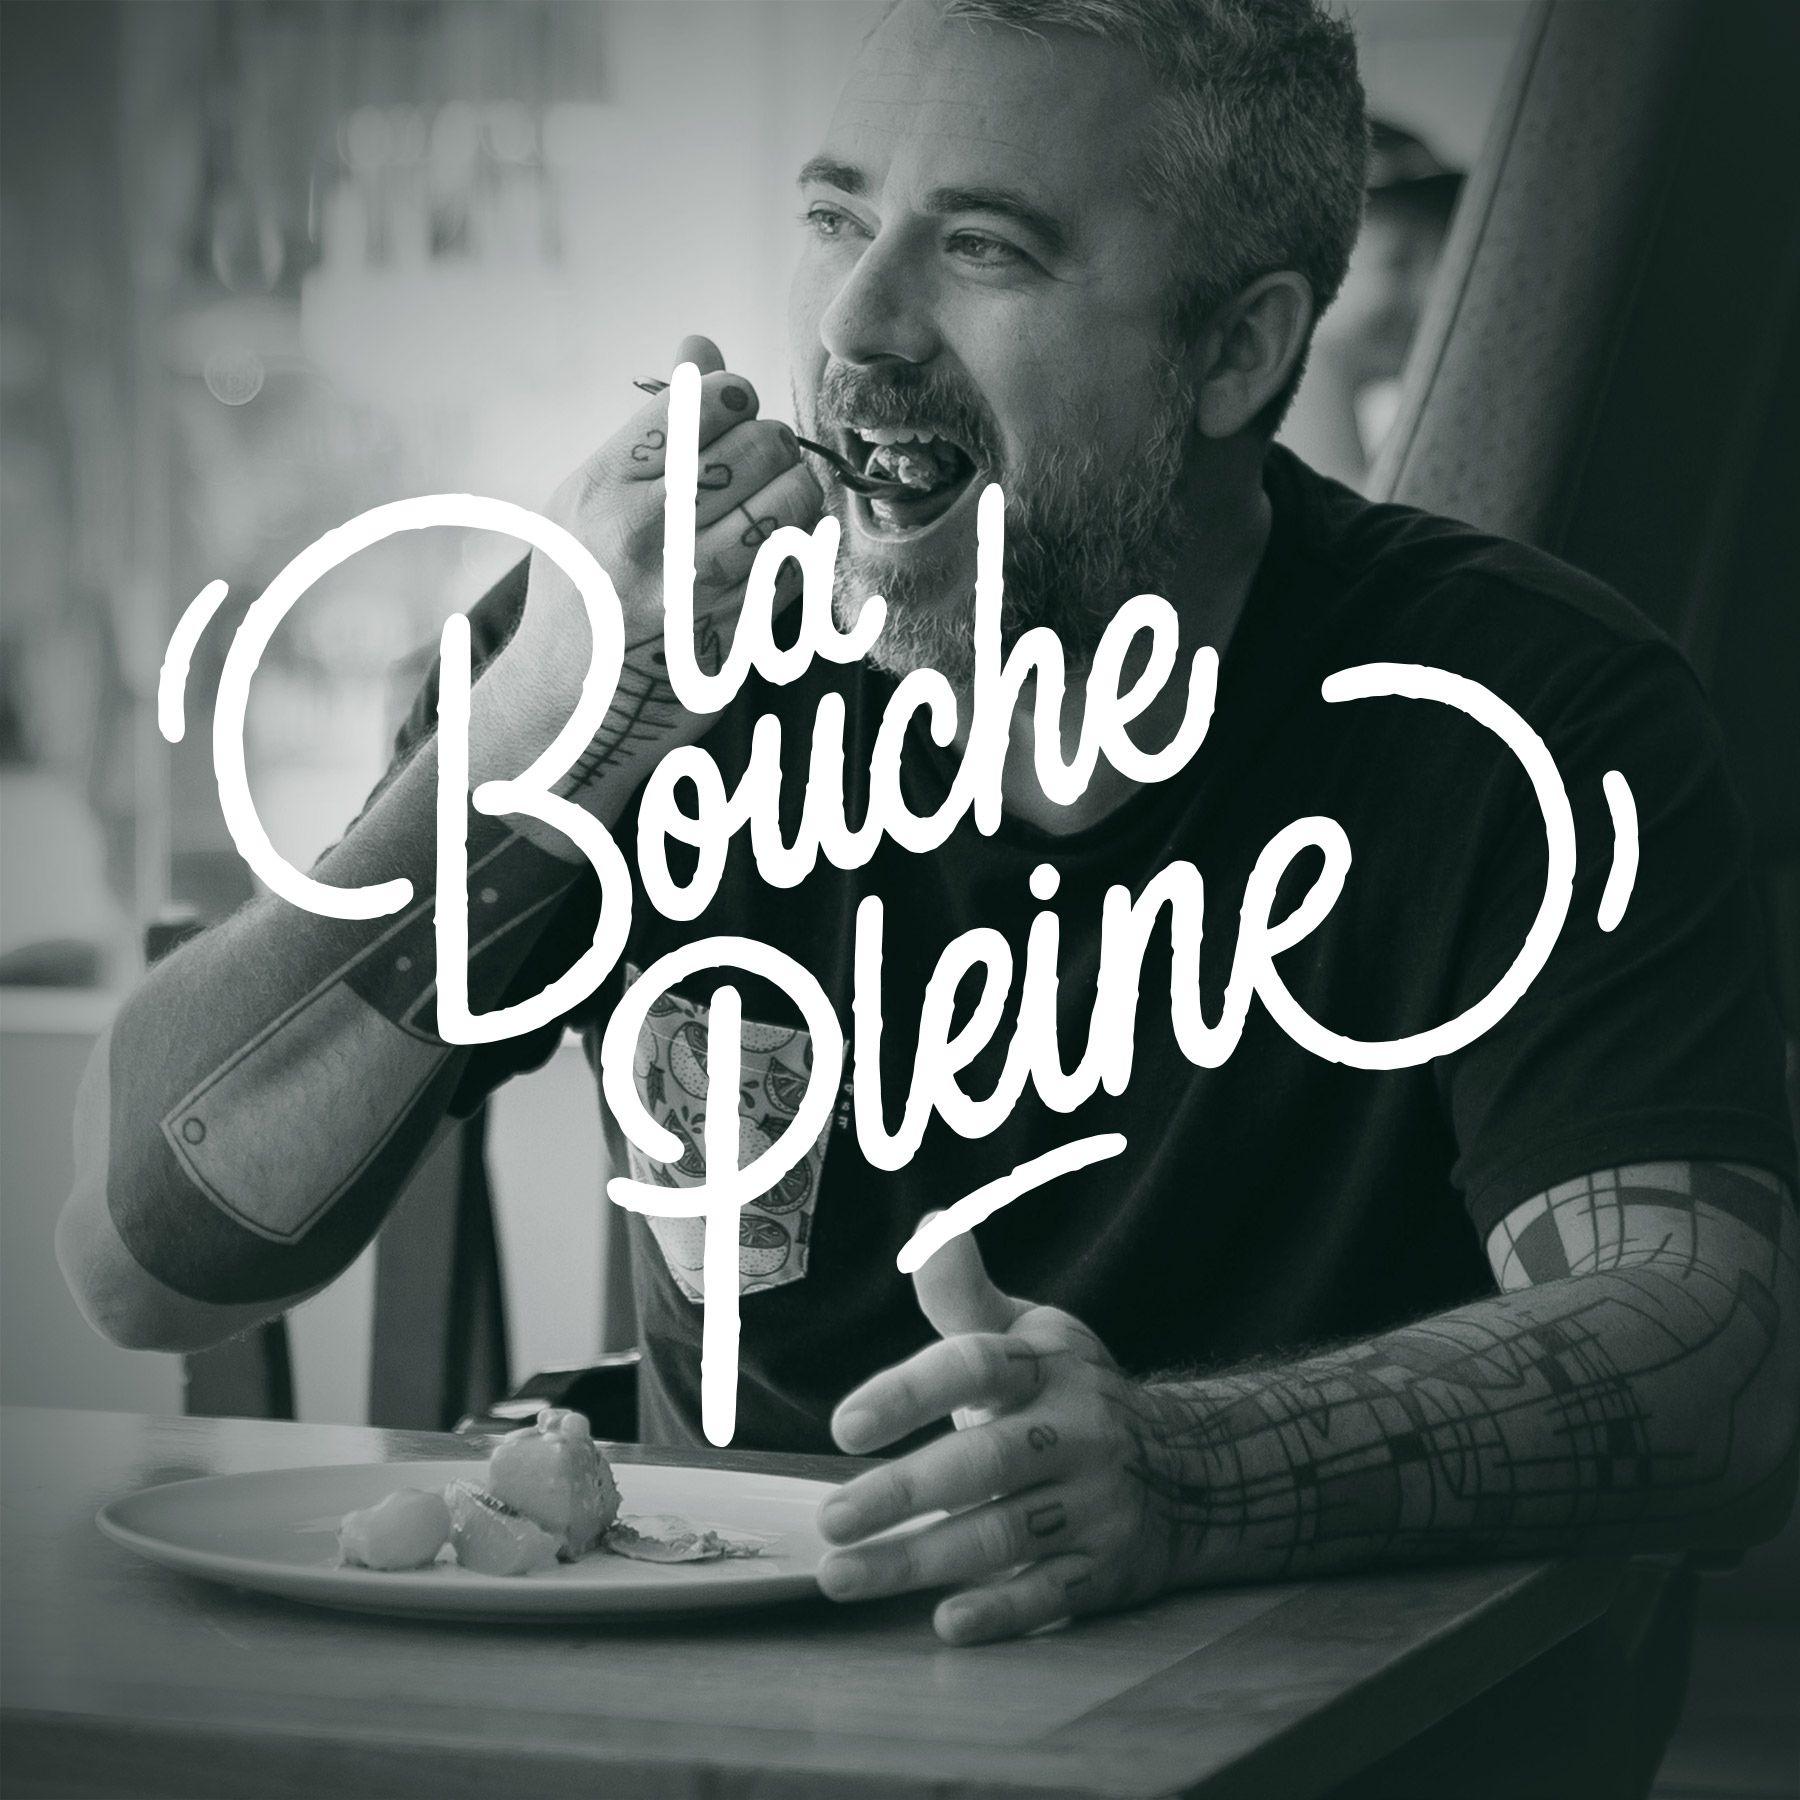 La bouche Pleine podcast logo by Bruno Florin